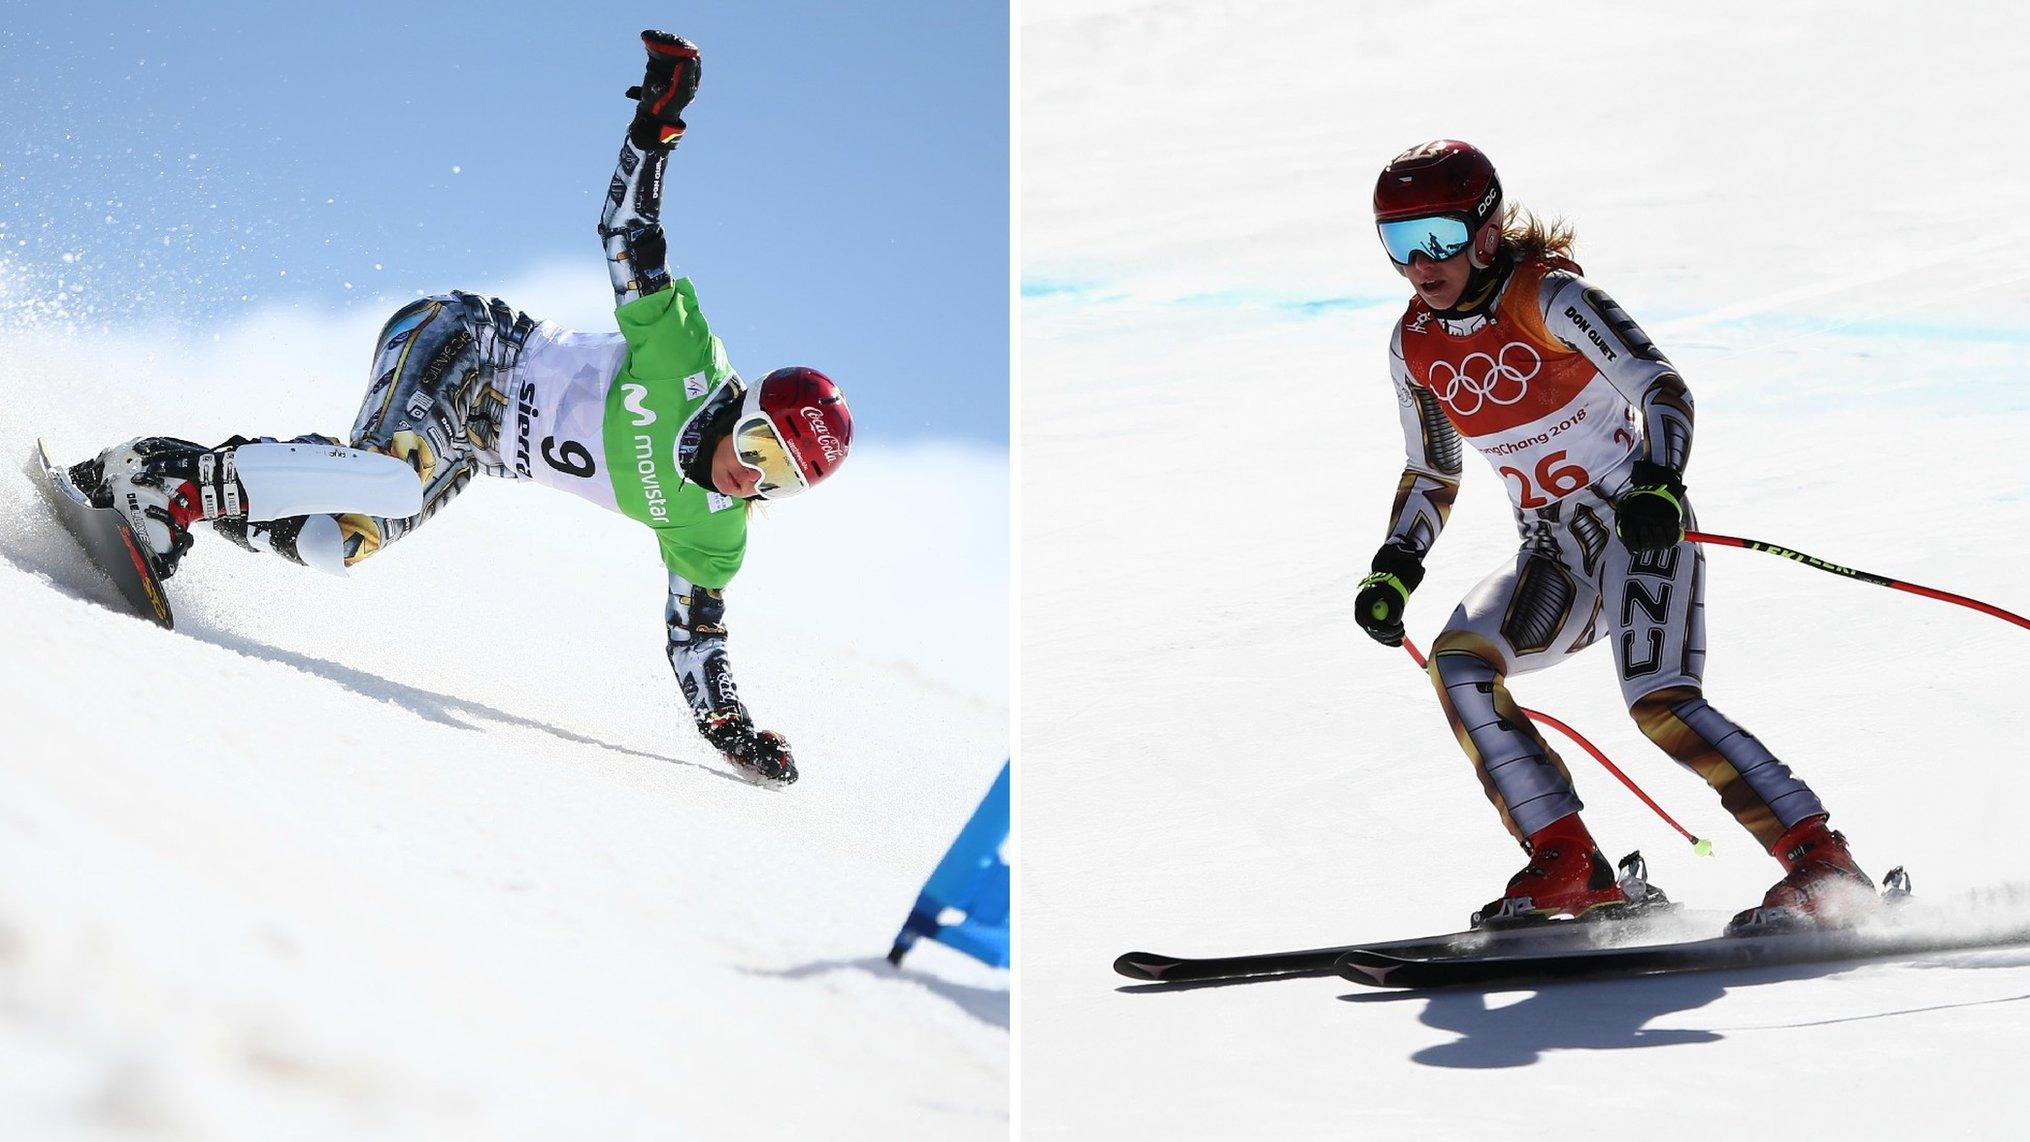 Winter Olympics: Ester Ledecka - the snowboarder who won gold on borrowed skis